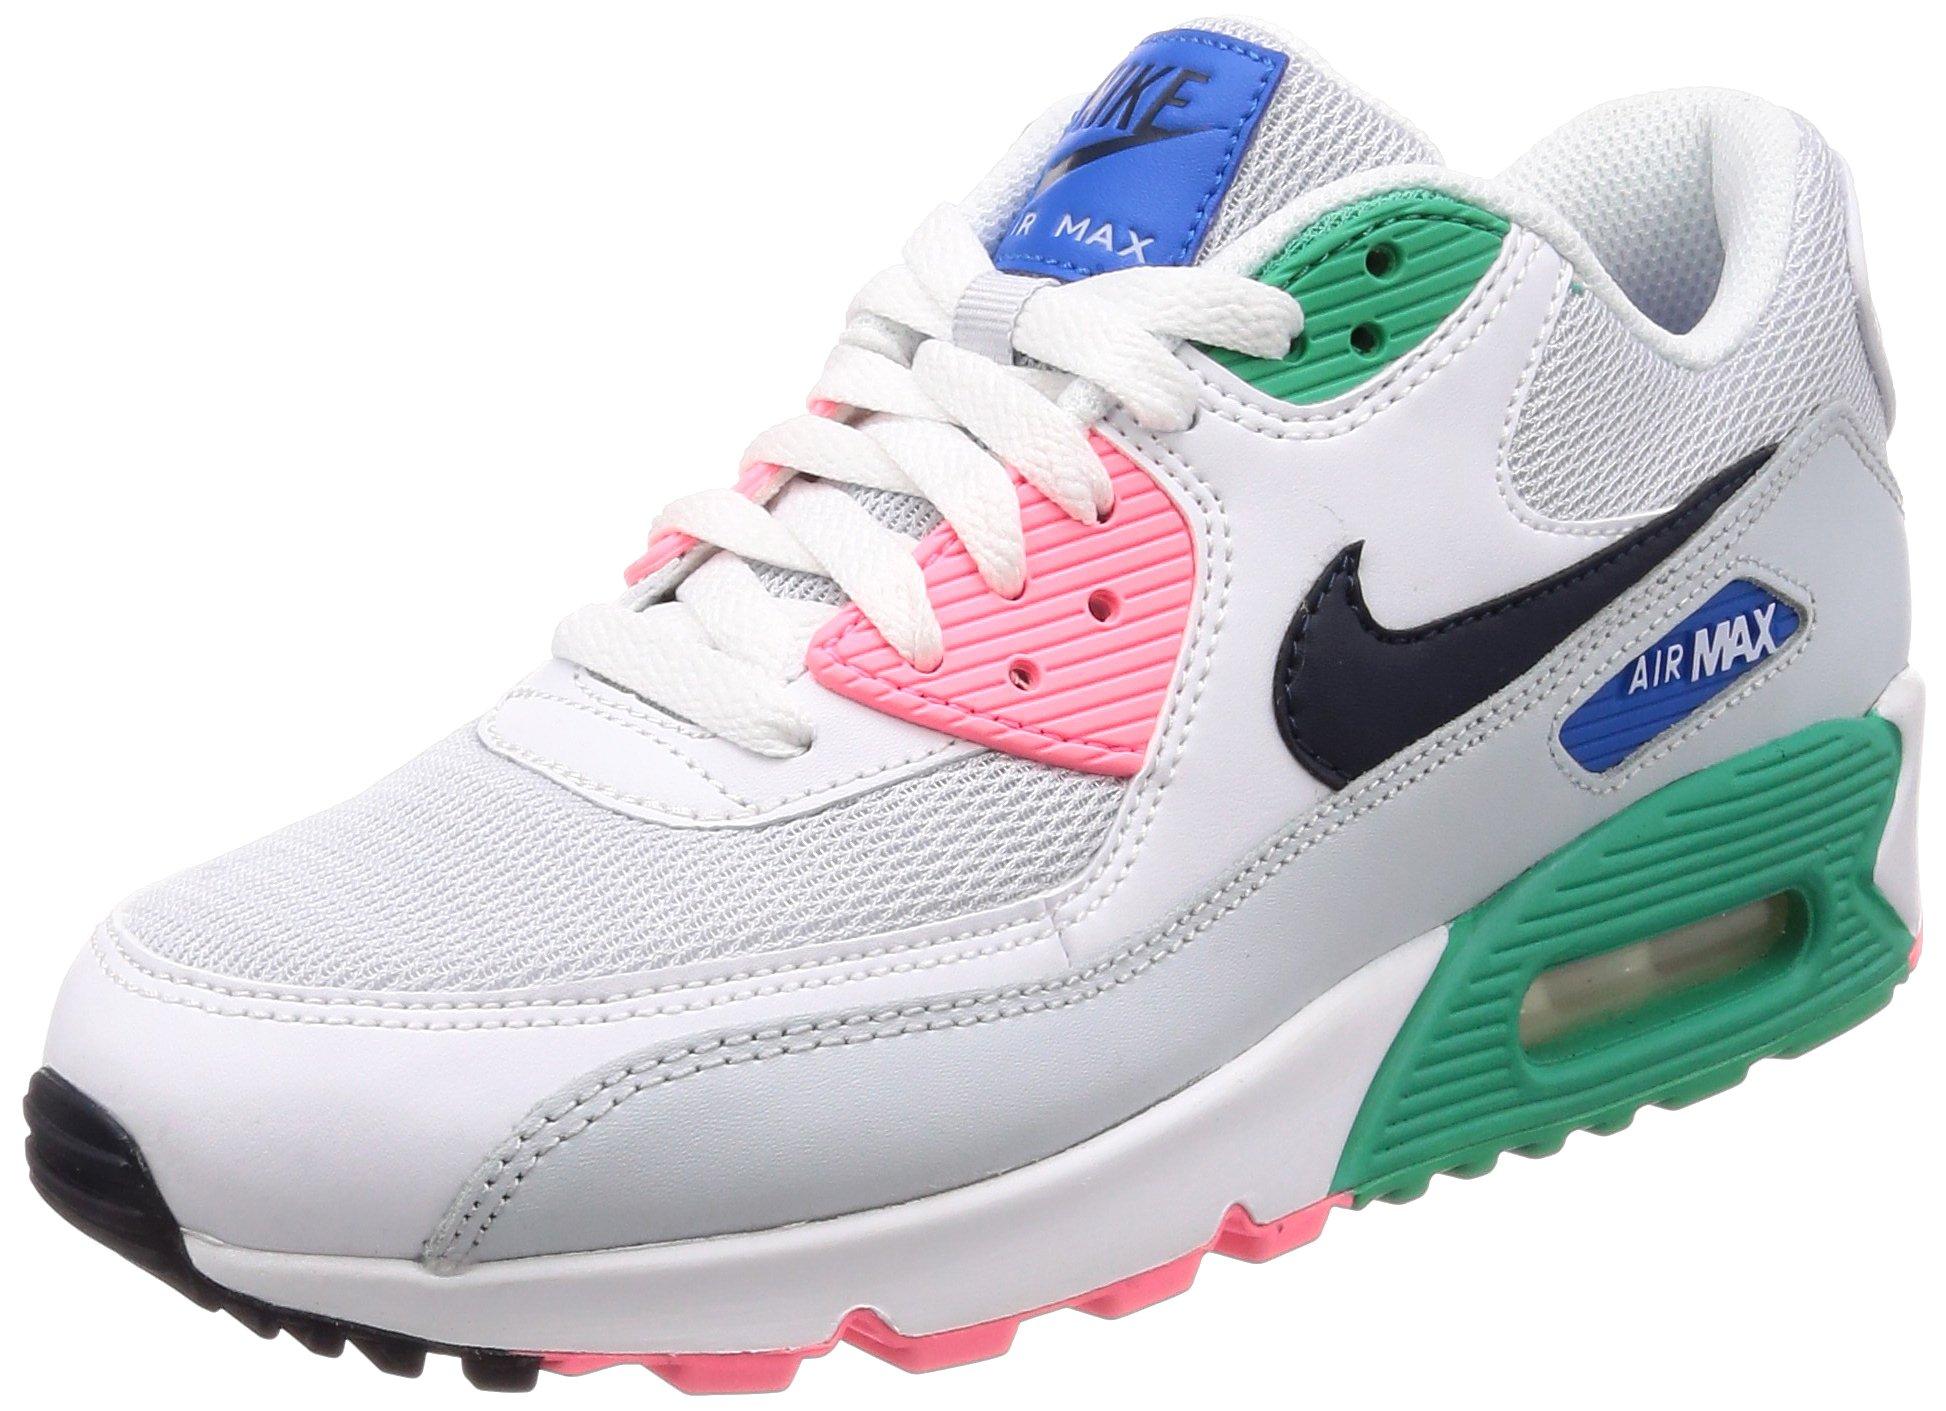 Nike Air Max 90 Essential Mens Running Trainers AJ1285 Sneakers Shoes (UK 6 US 7 EU 40, White Obsidian Pure Platinum 100)